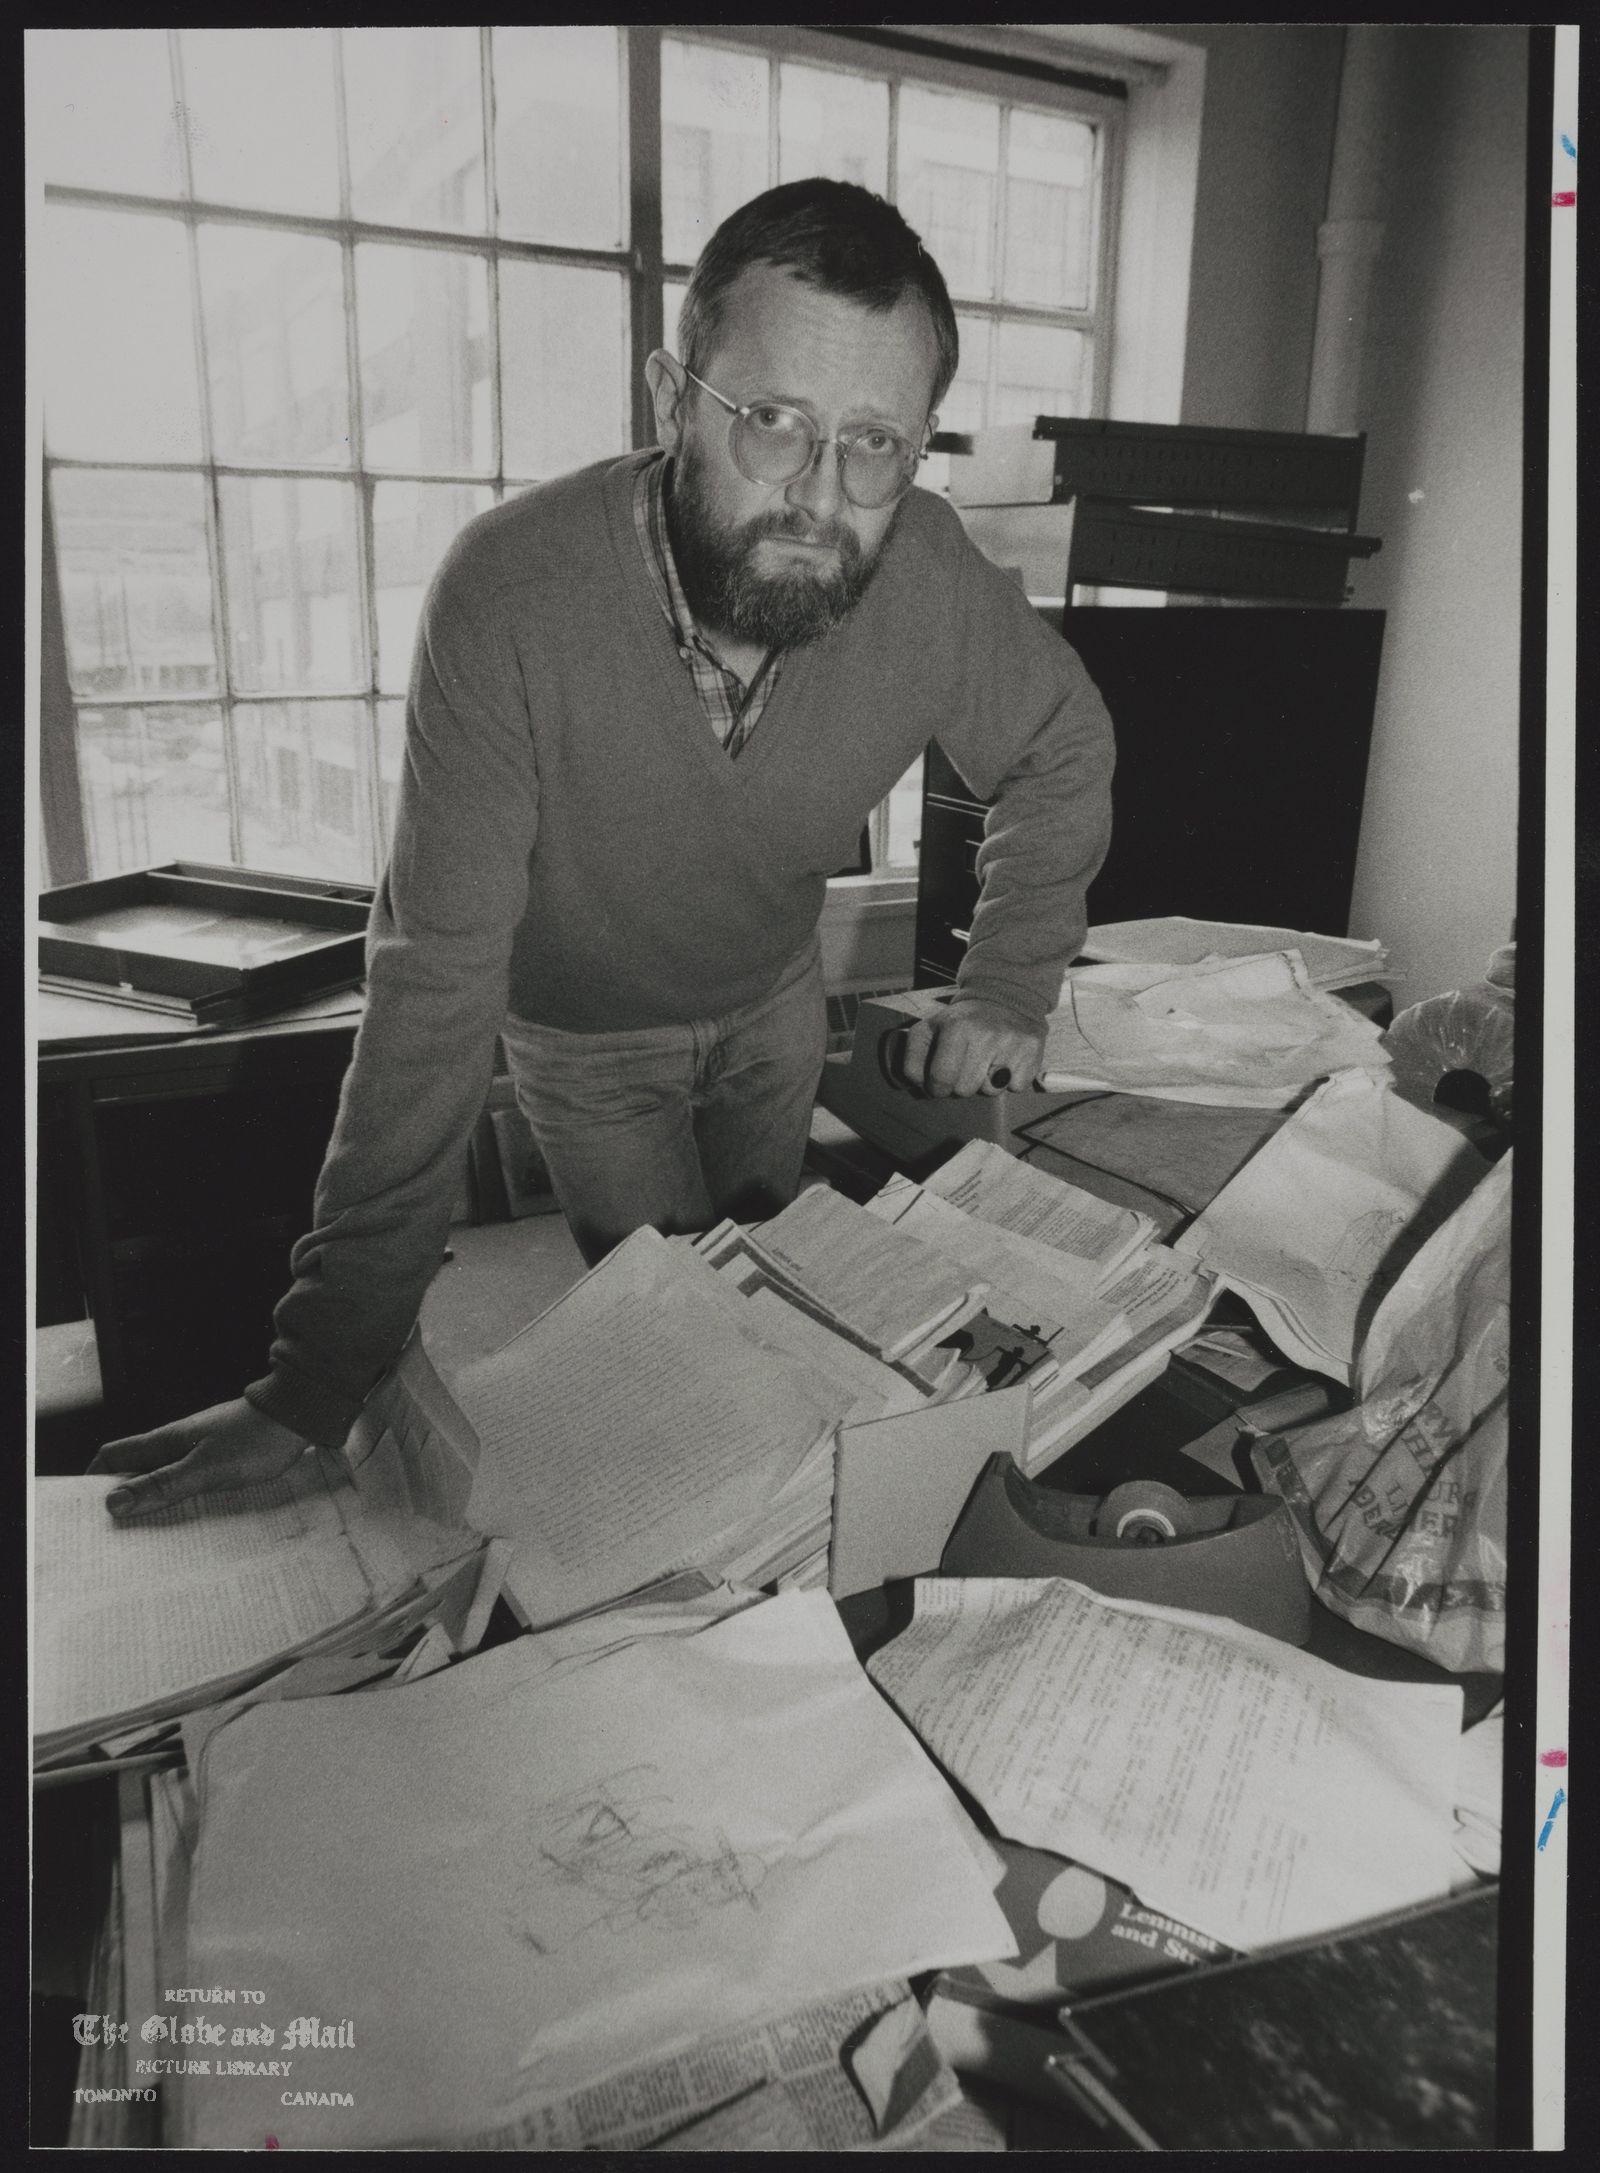 UNIVERSITY OF TORONTO Sociology Dept. Professor Michael Bodemann stands in flooded office.